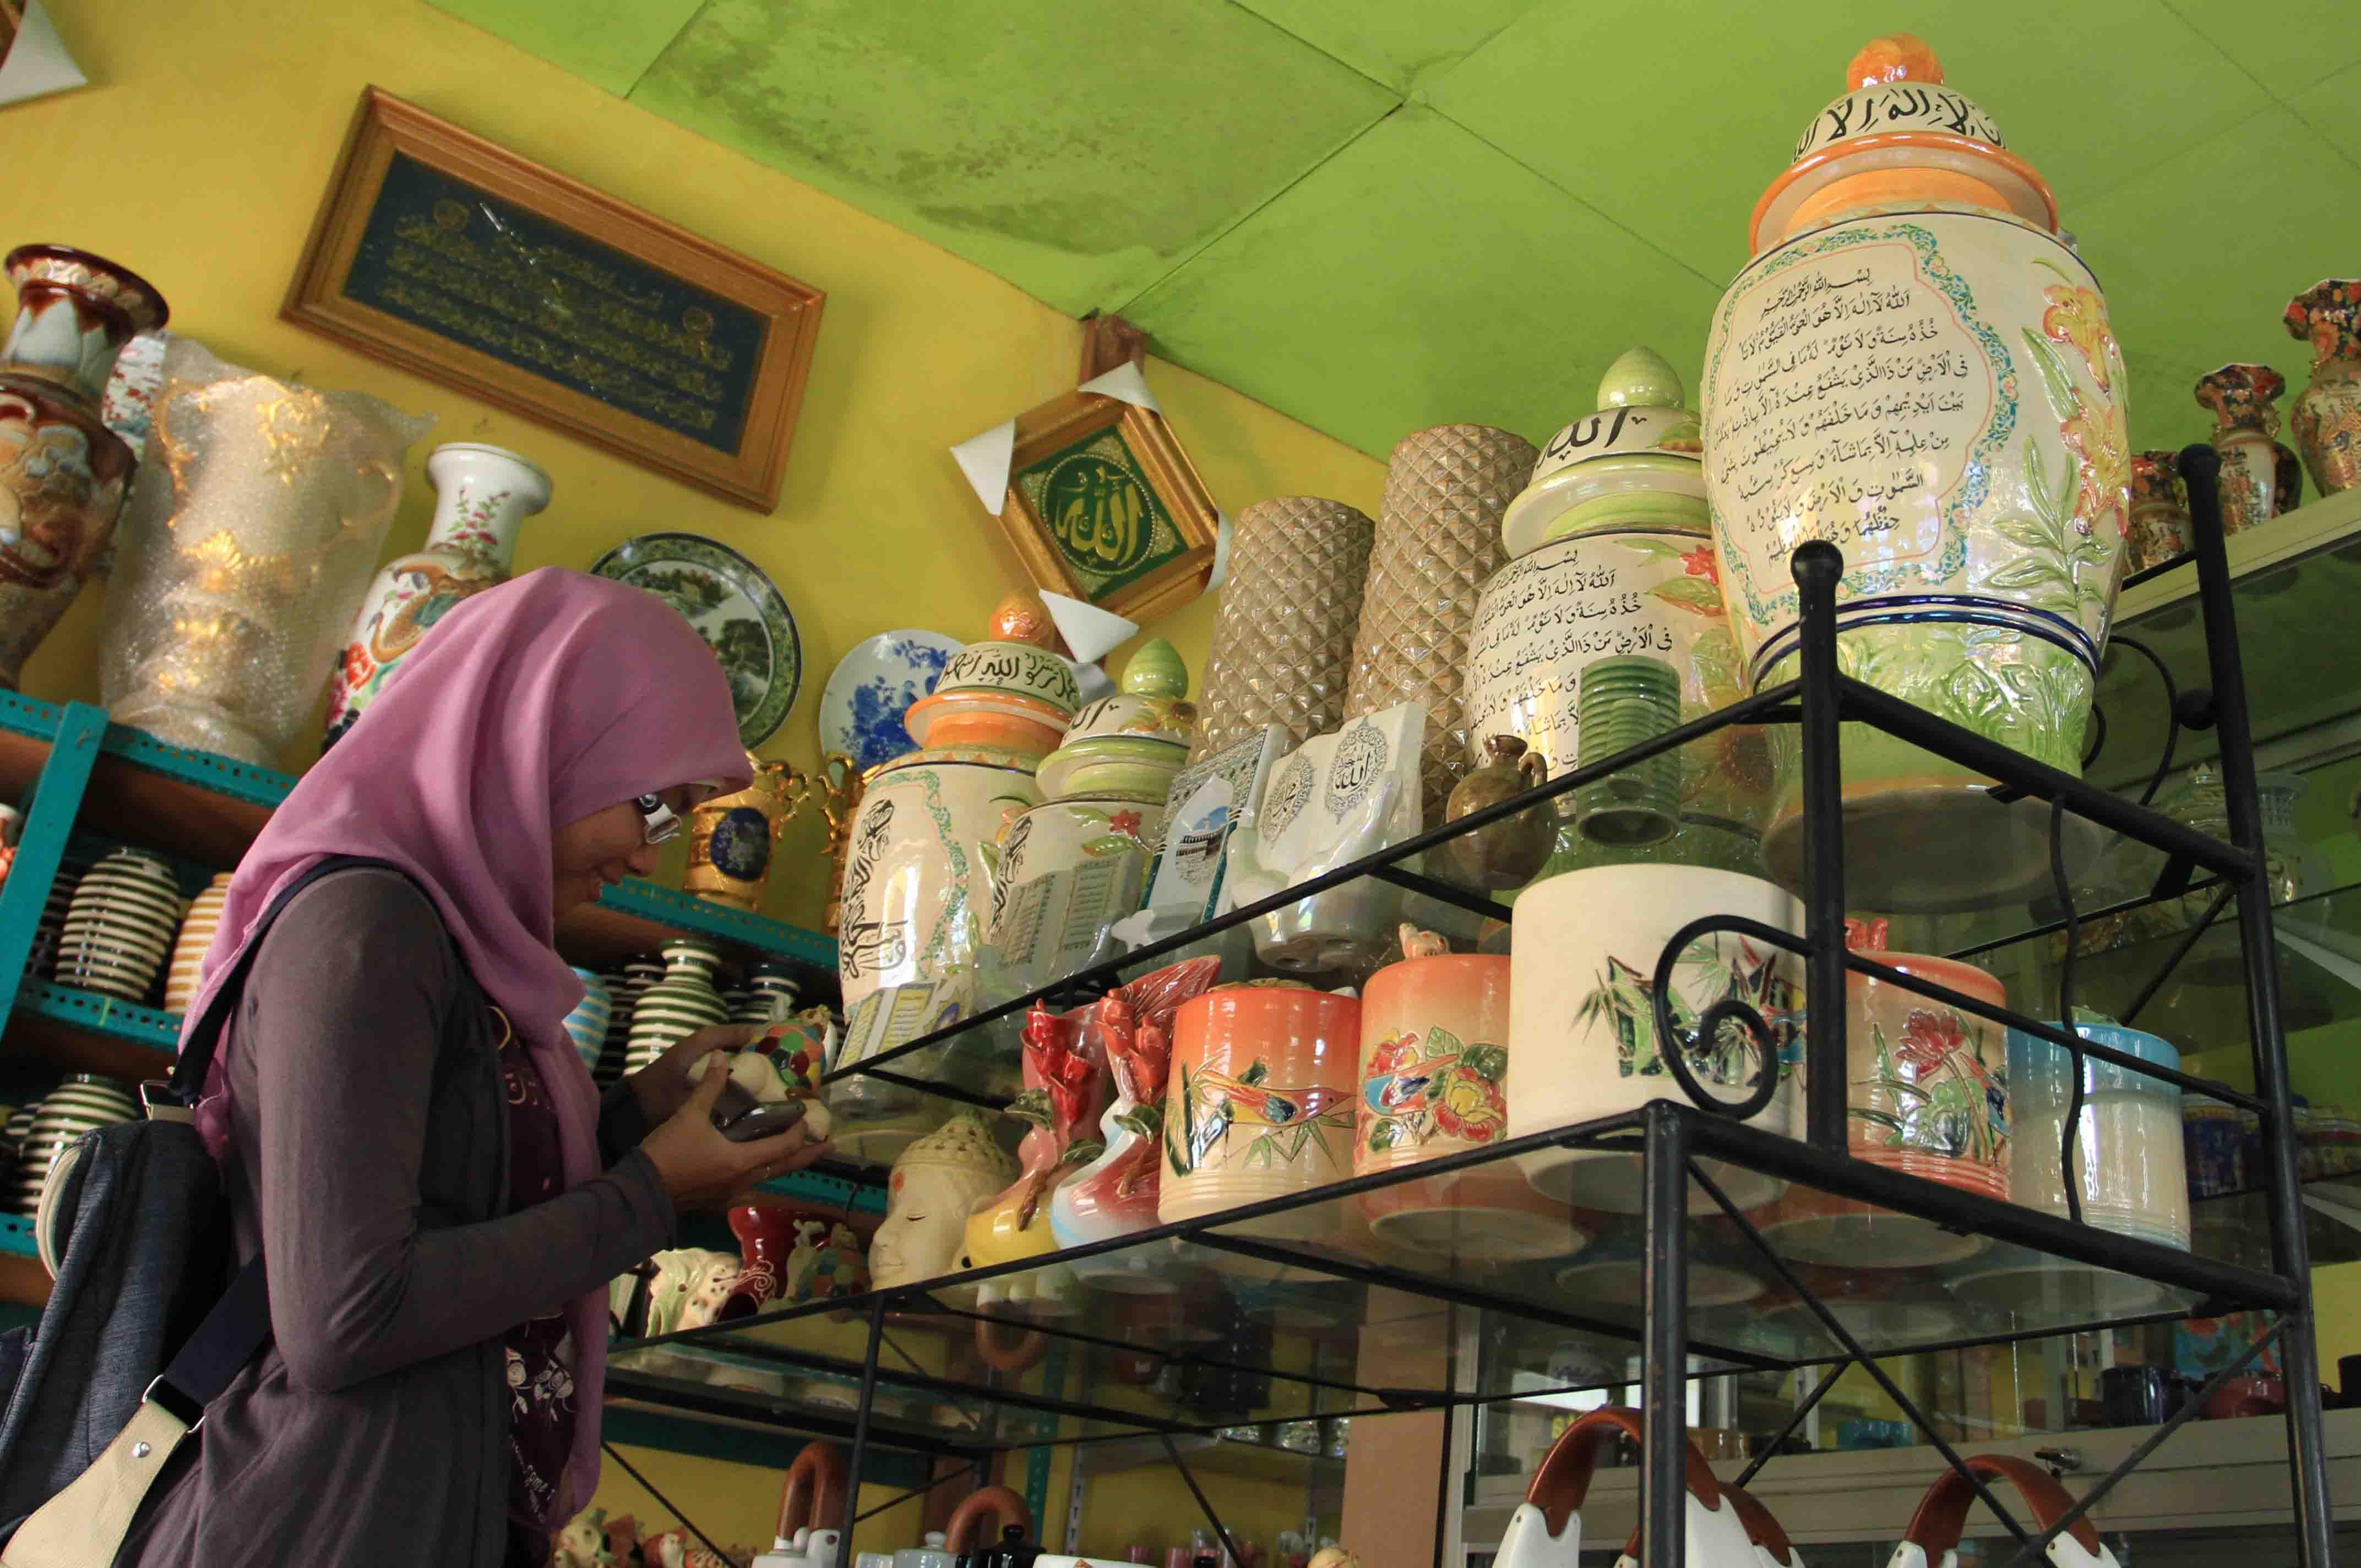 Keramik Dinoyo 1 Terakota Kampung Kota Malang